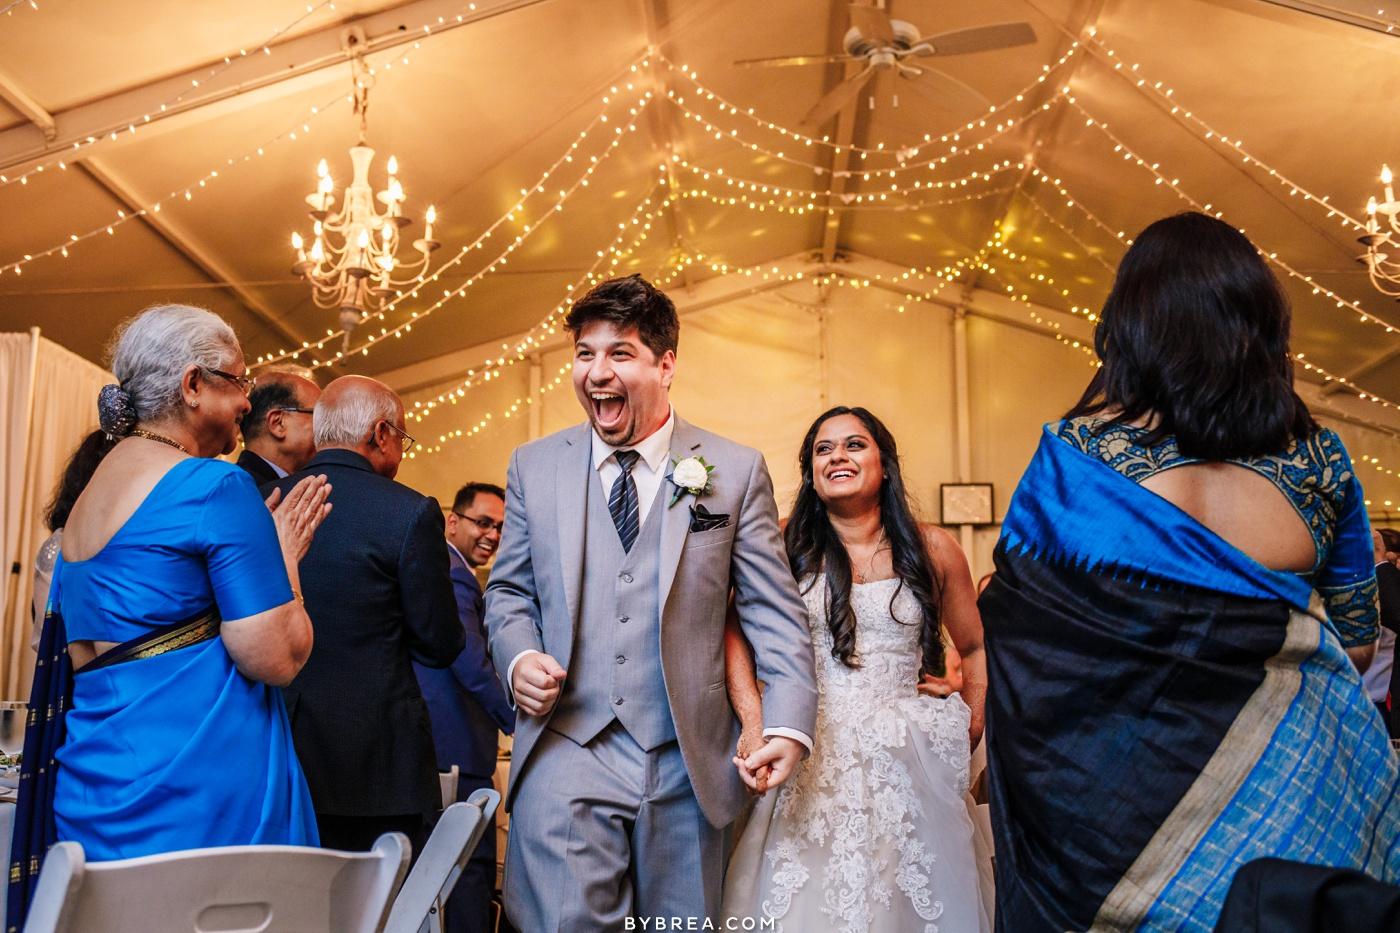 Elkridge Furnace Inn bride and groom walking into tent during reception.